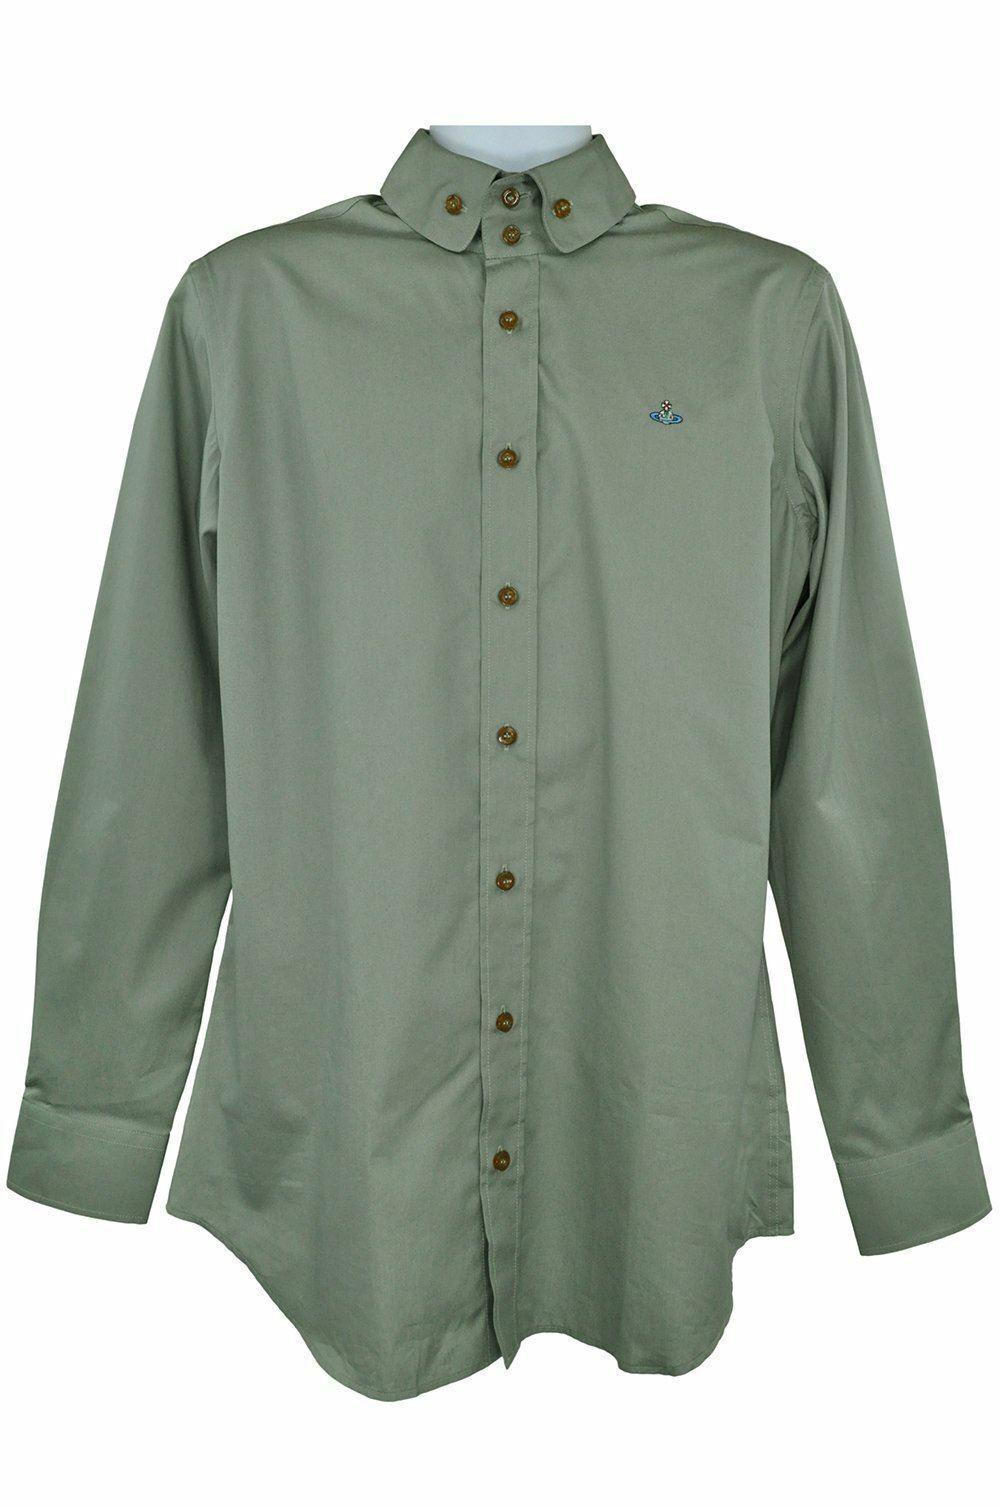 76a72193 Vivienne Westwood Green long sleeve size 40 RRP195 PU202 shirt ...